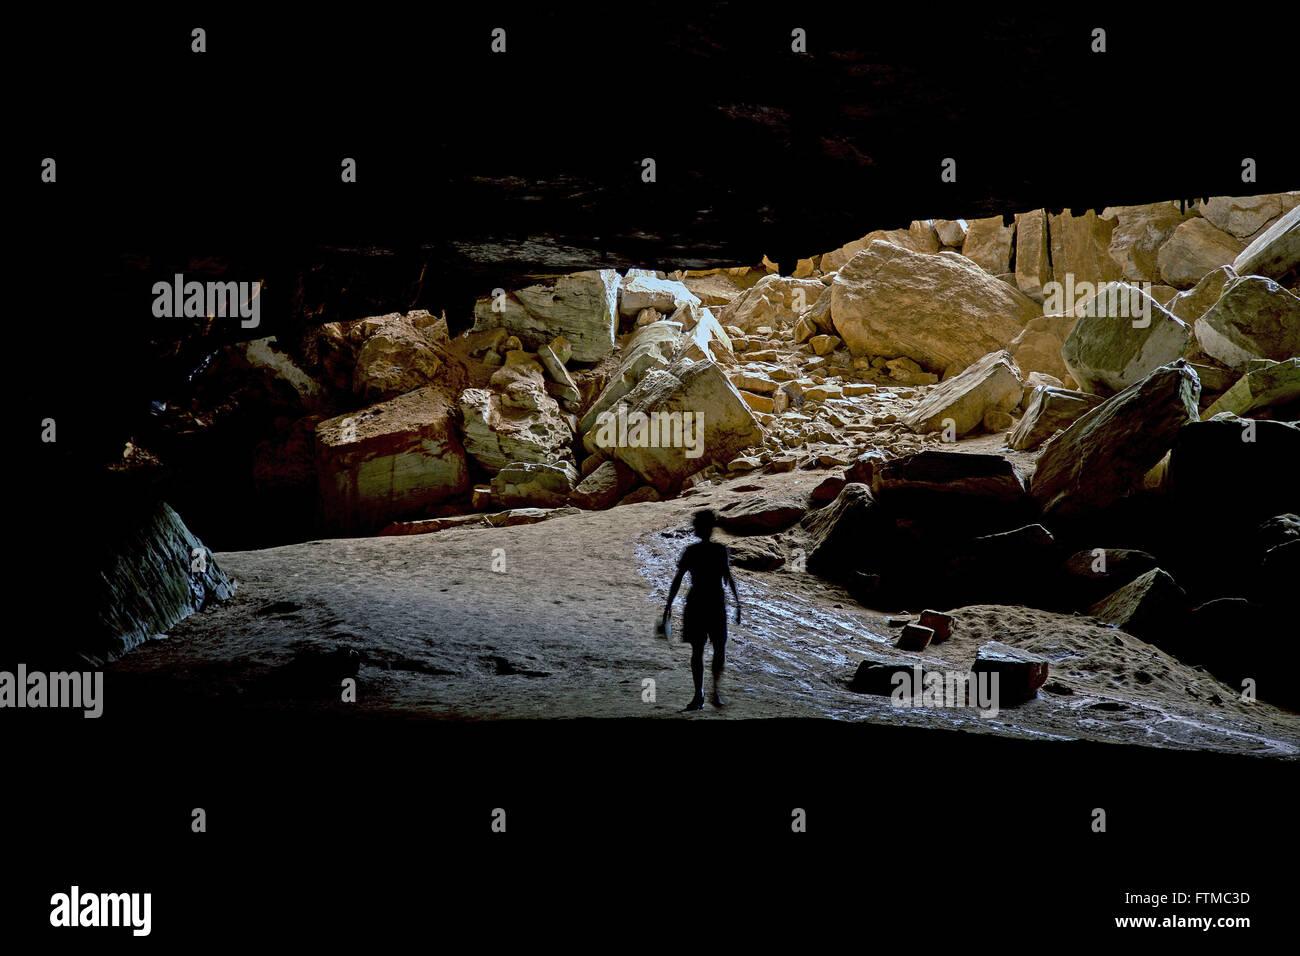 Ecotourist in Torrinha Cave of Chapada Diamantina - Stock Image